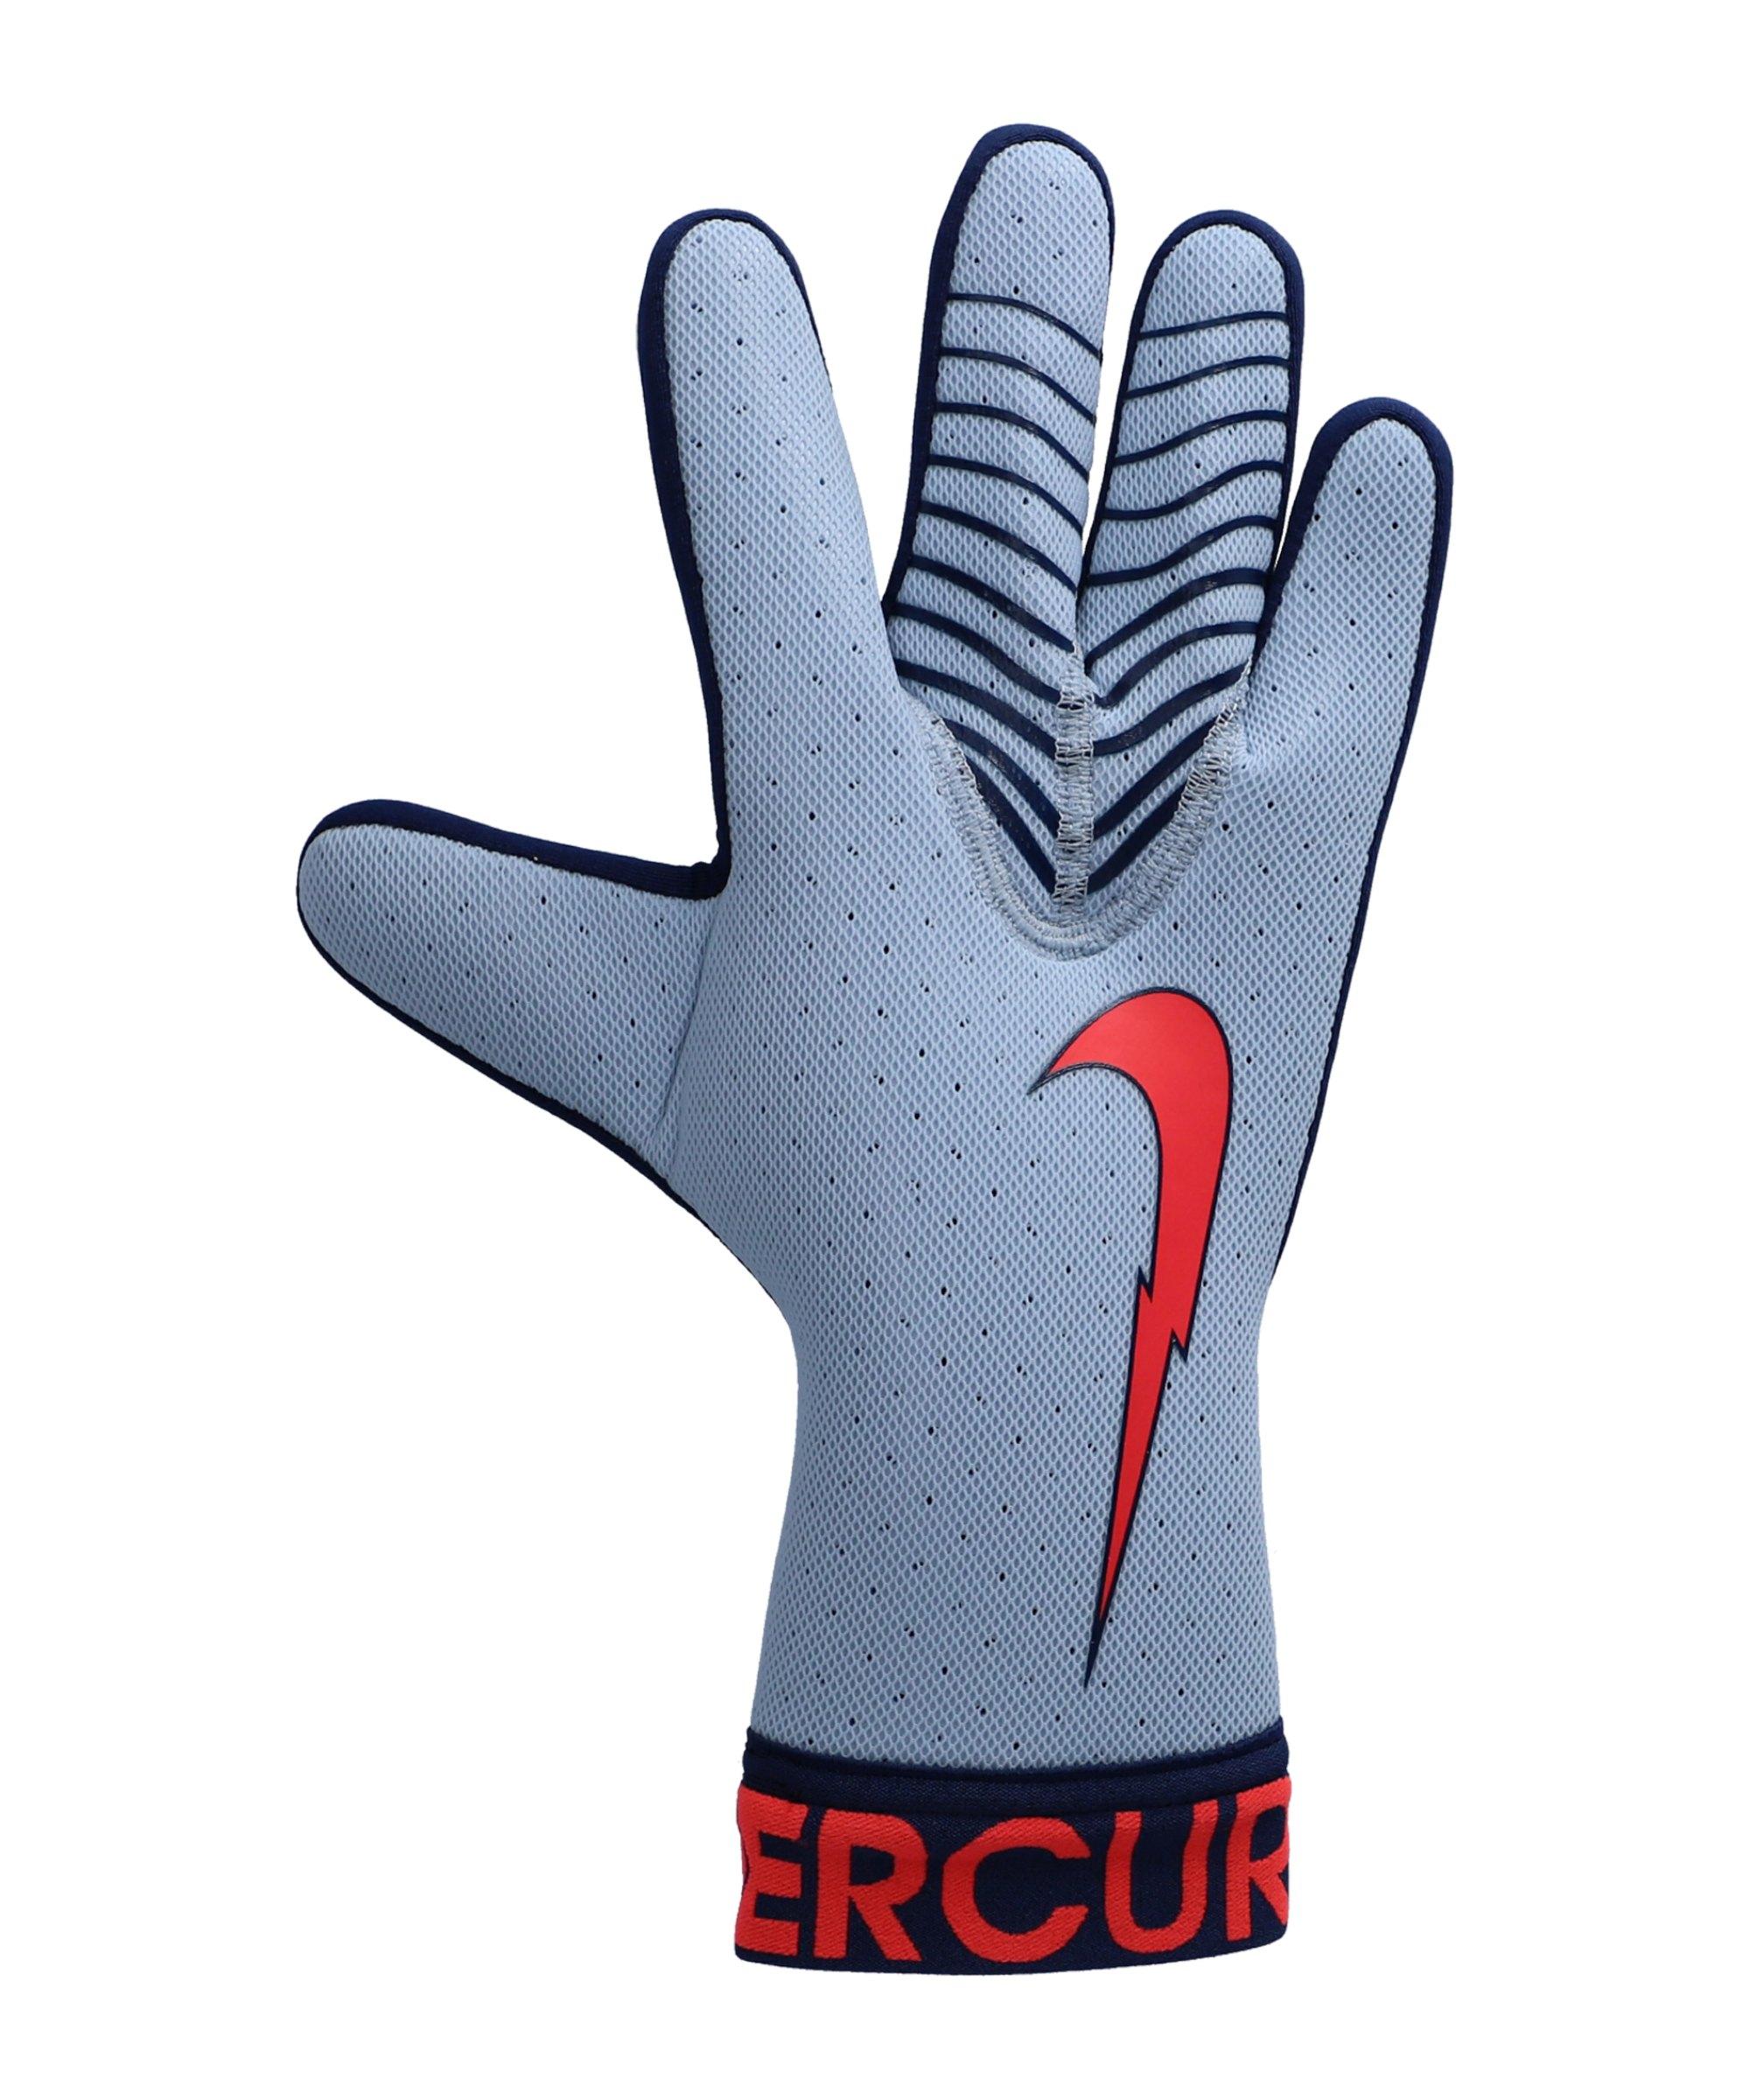 Nike Mercurial Touch Elite Promo TW-Handschuh F440 - blau